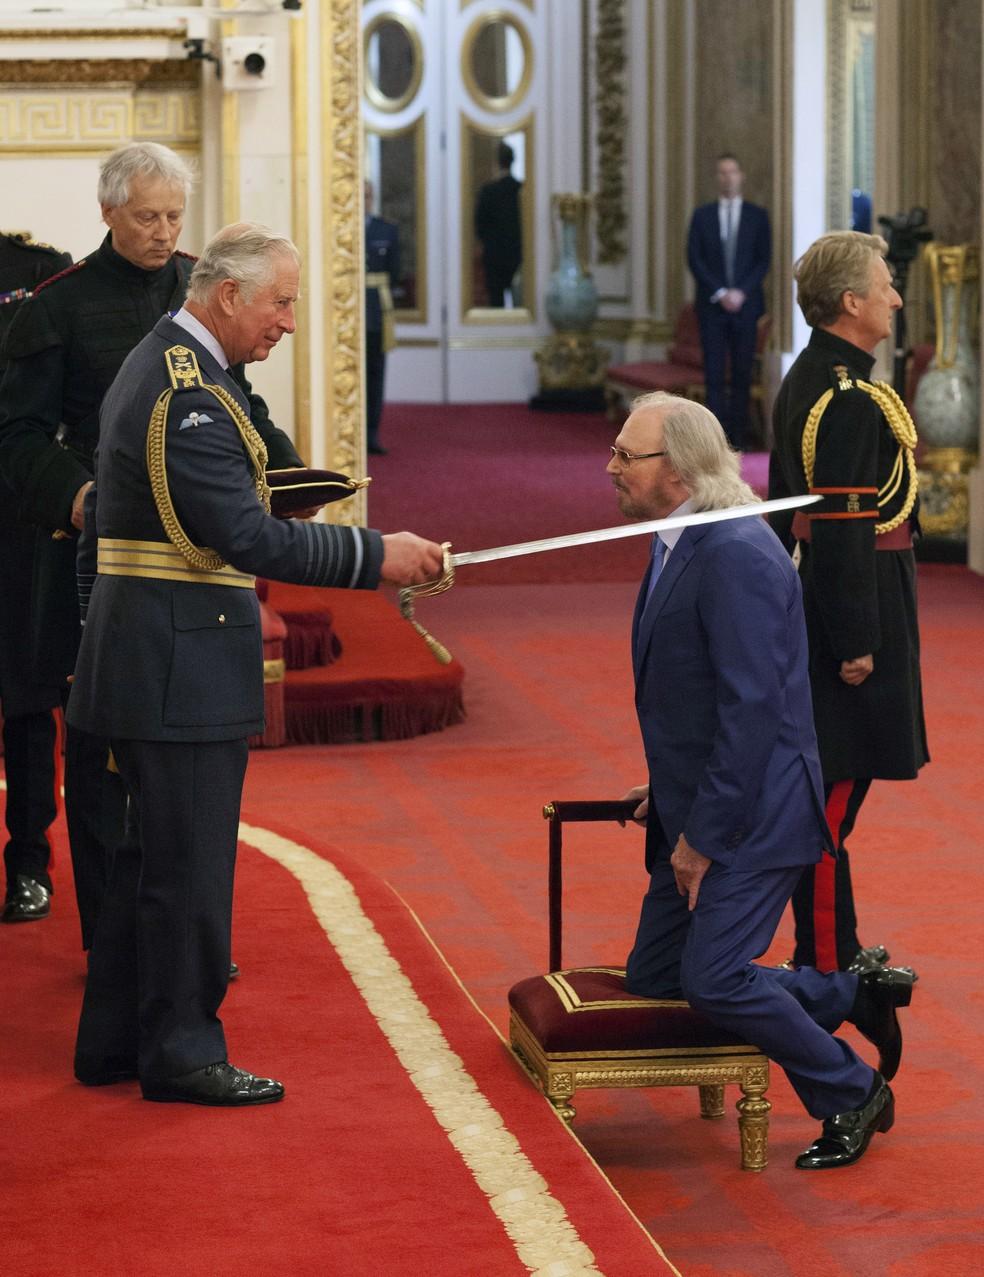 O cantor Barry Gibb, do grupo Bee Gees, é condecorado pelo príncipe Charles e recebe título de cavaleiro do Palácio de Buckingham (Foto: Dominic Lipinski/PA via AP)